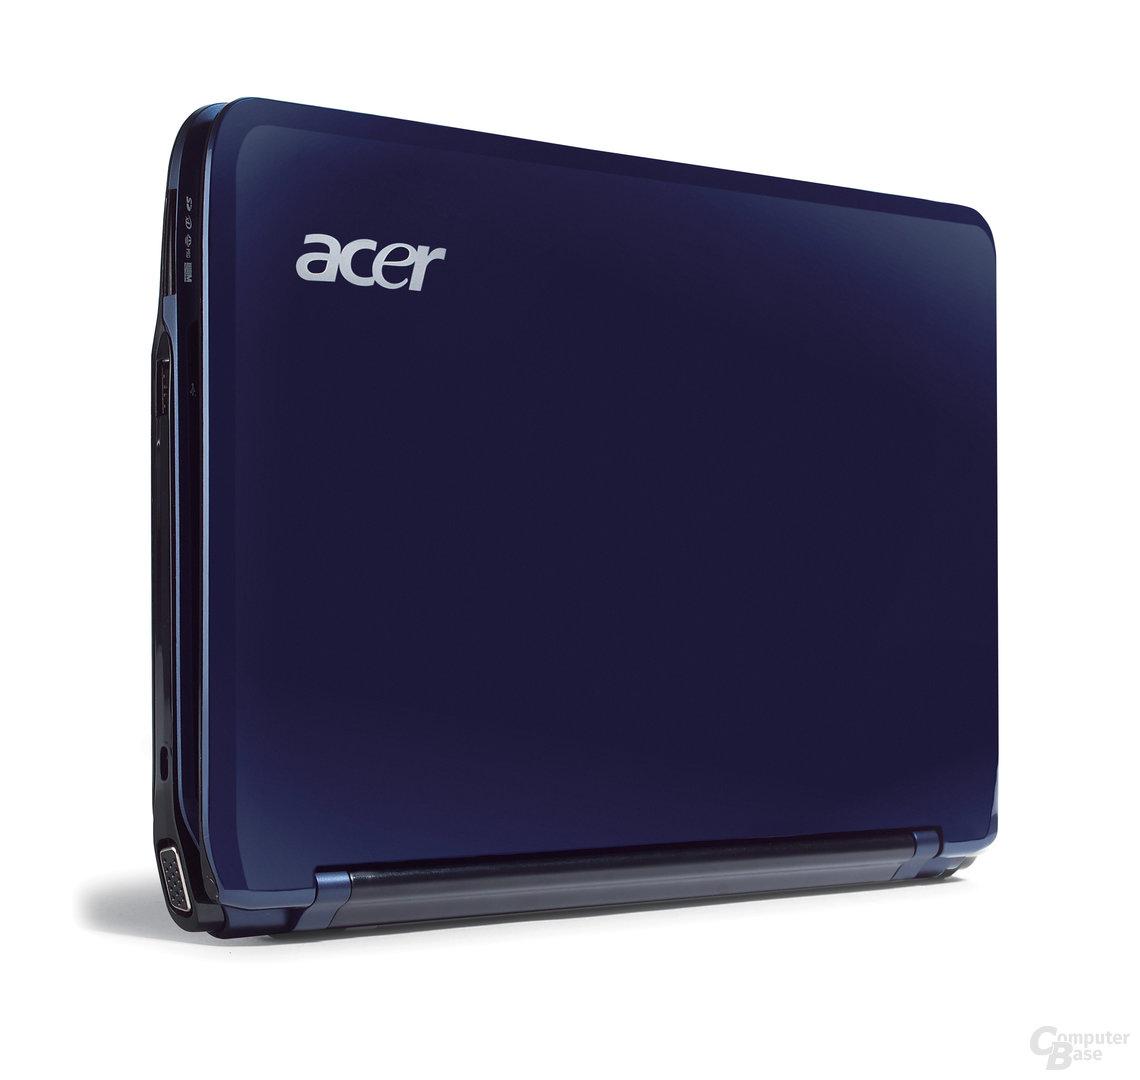 Acer Aspire one 751 in blau